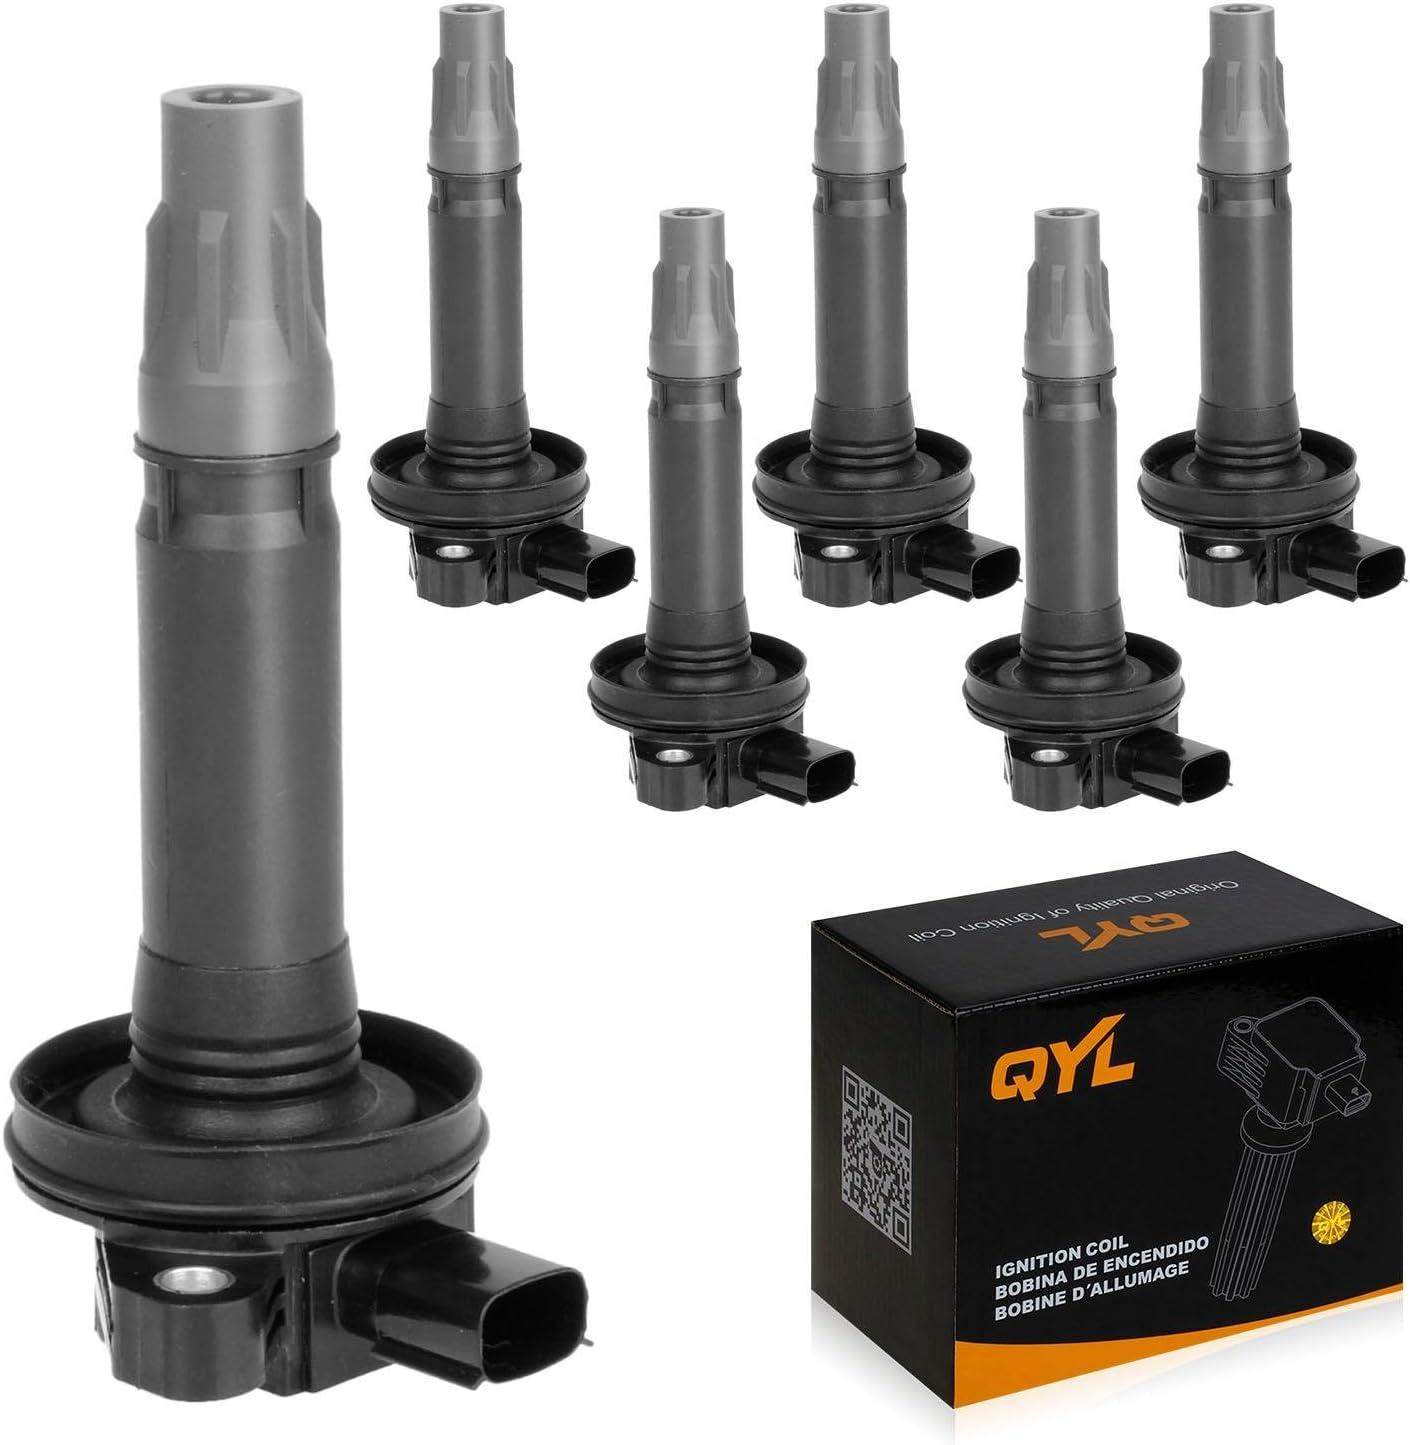 Set of 6 QYL Ignition Coil UF553 /& Spark Plug 5019 LTR5GP Replacement for Flex Taurus Edge MKS MKT MKZ MKX 3.5L V6